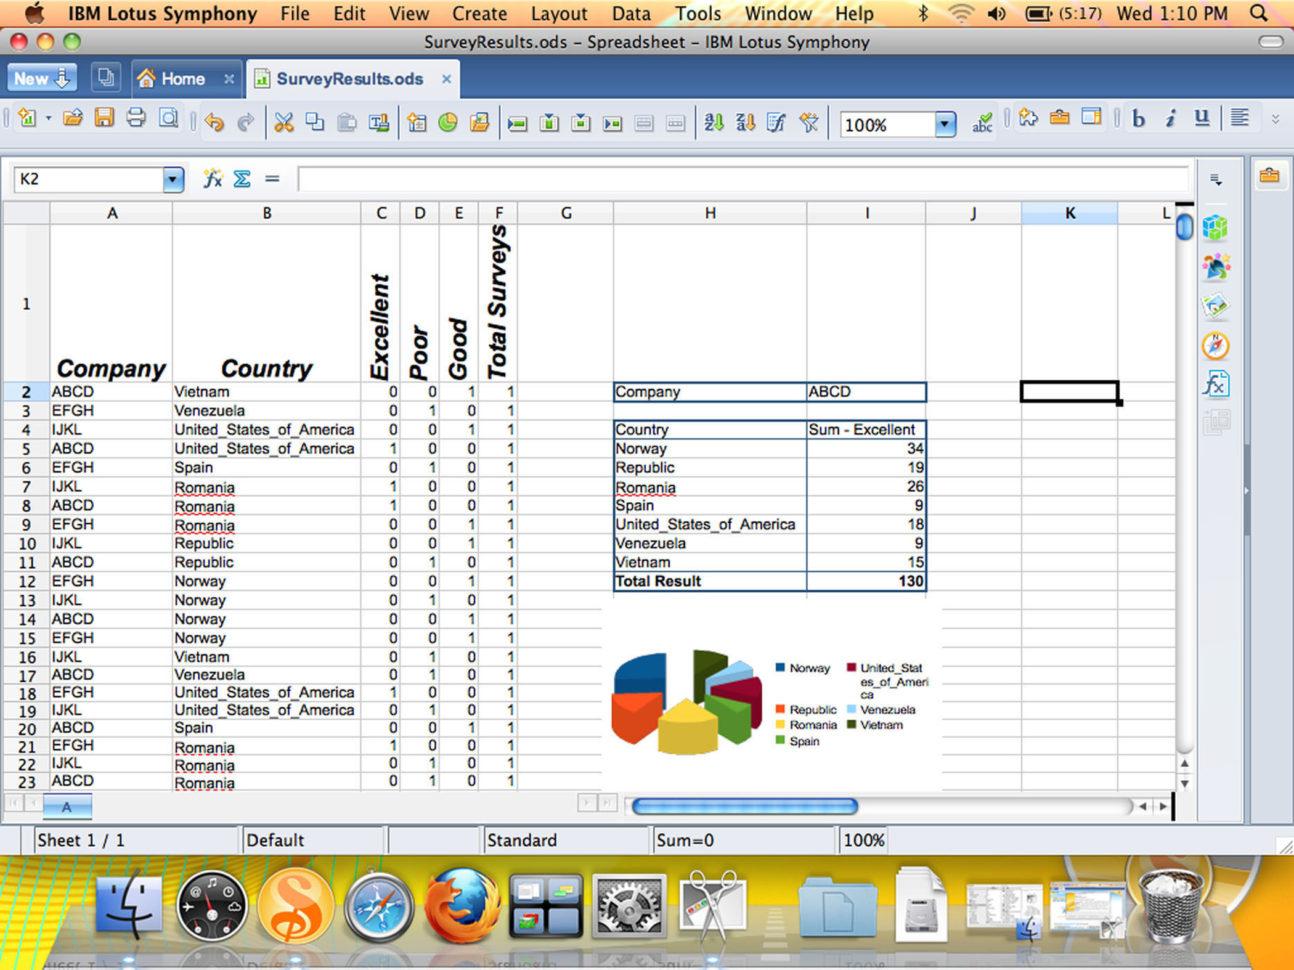 Lotus Spreadsheet With Ibm News Room  Creating A Spreadsheet With Lotus Symphony On A Mac